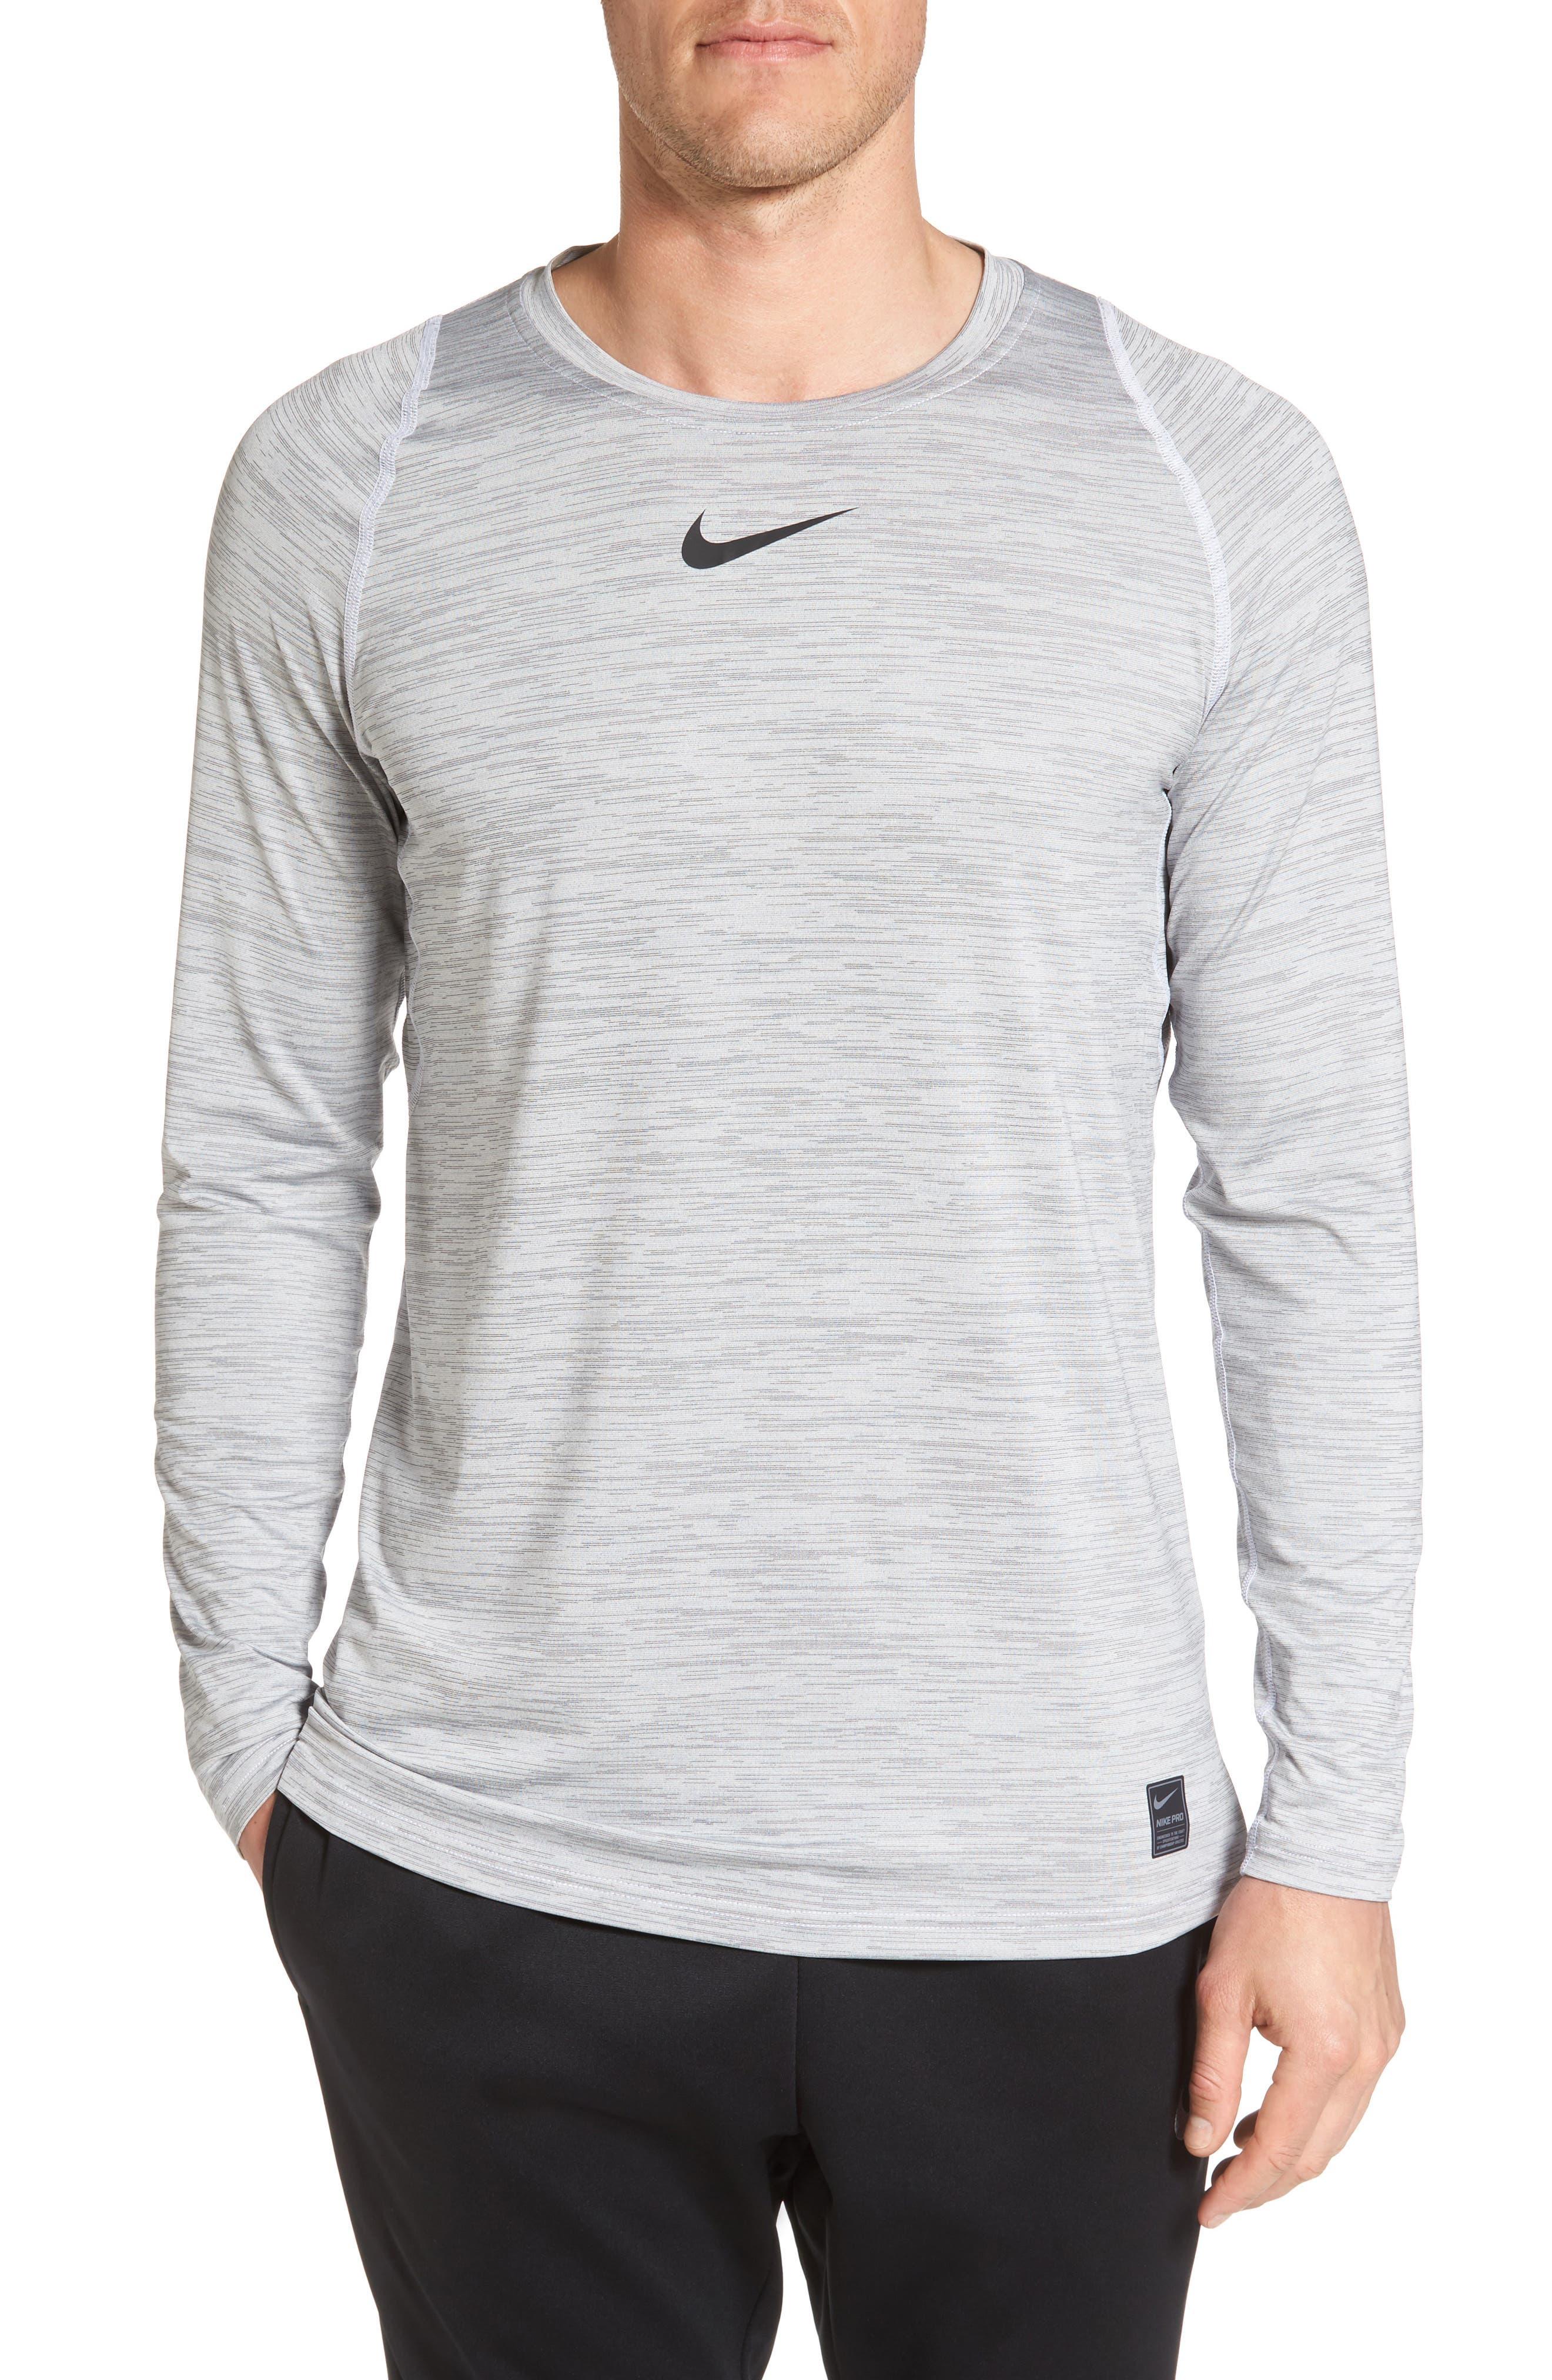 Pro Long Sleeve T-Shirt,                         Main,                         color, White/ White/ Black